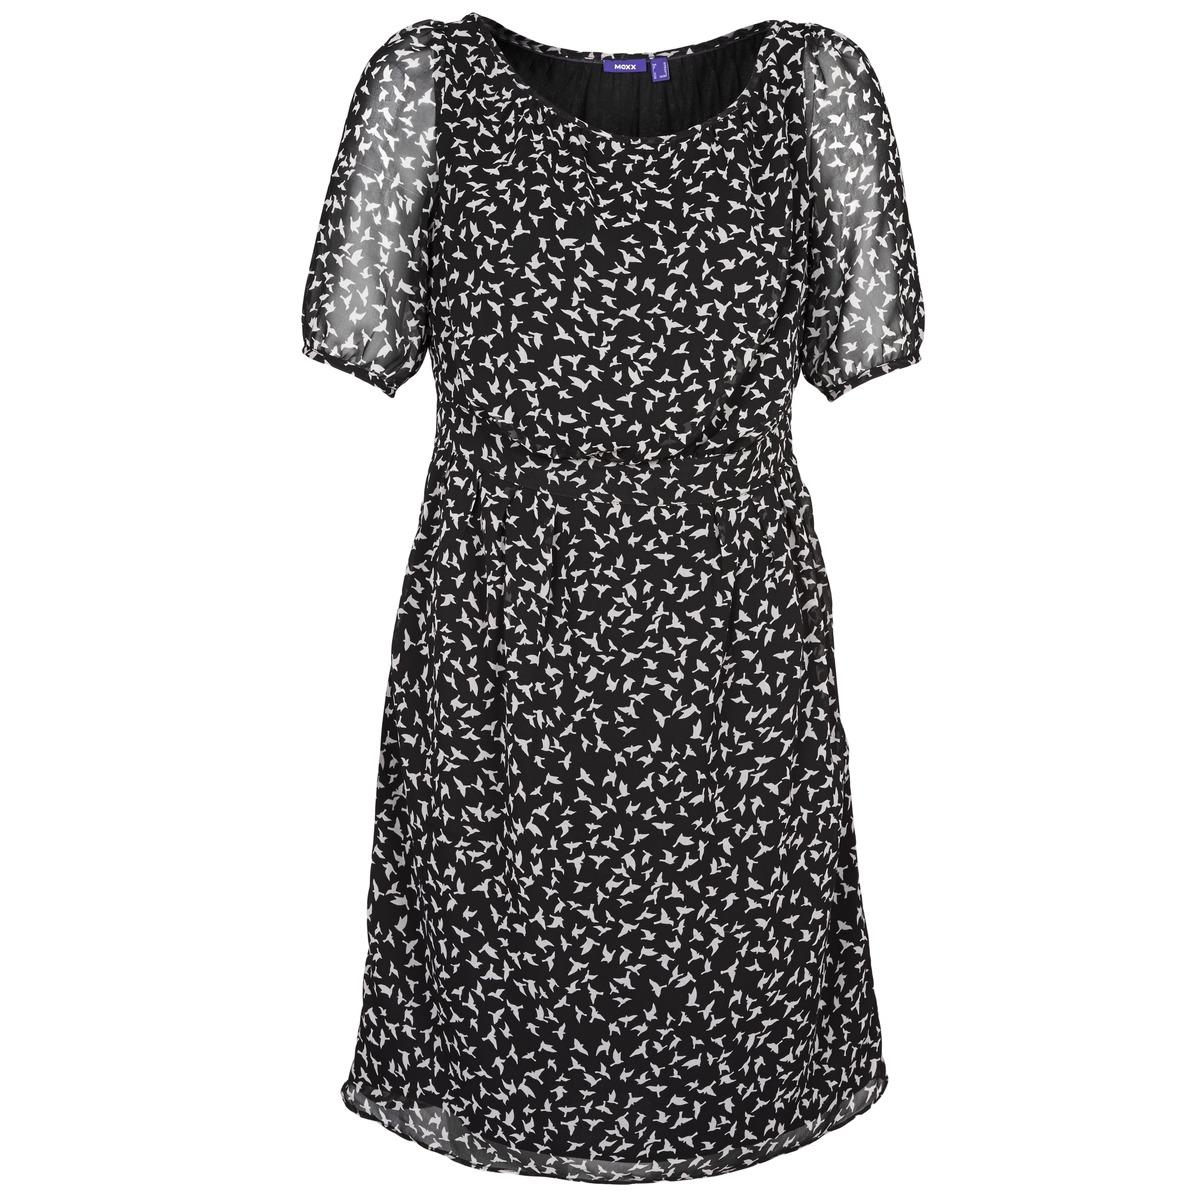 0d9ce18ce9fa Κοντά Φορέματα Mexx 13LW130 Σύνθεση: Πολυεστέρας, ΓΥΝΑΙΚΑ   ΡΟΥΧΑ ...